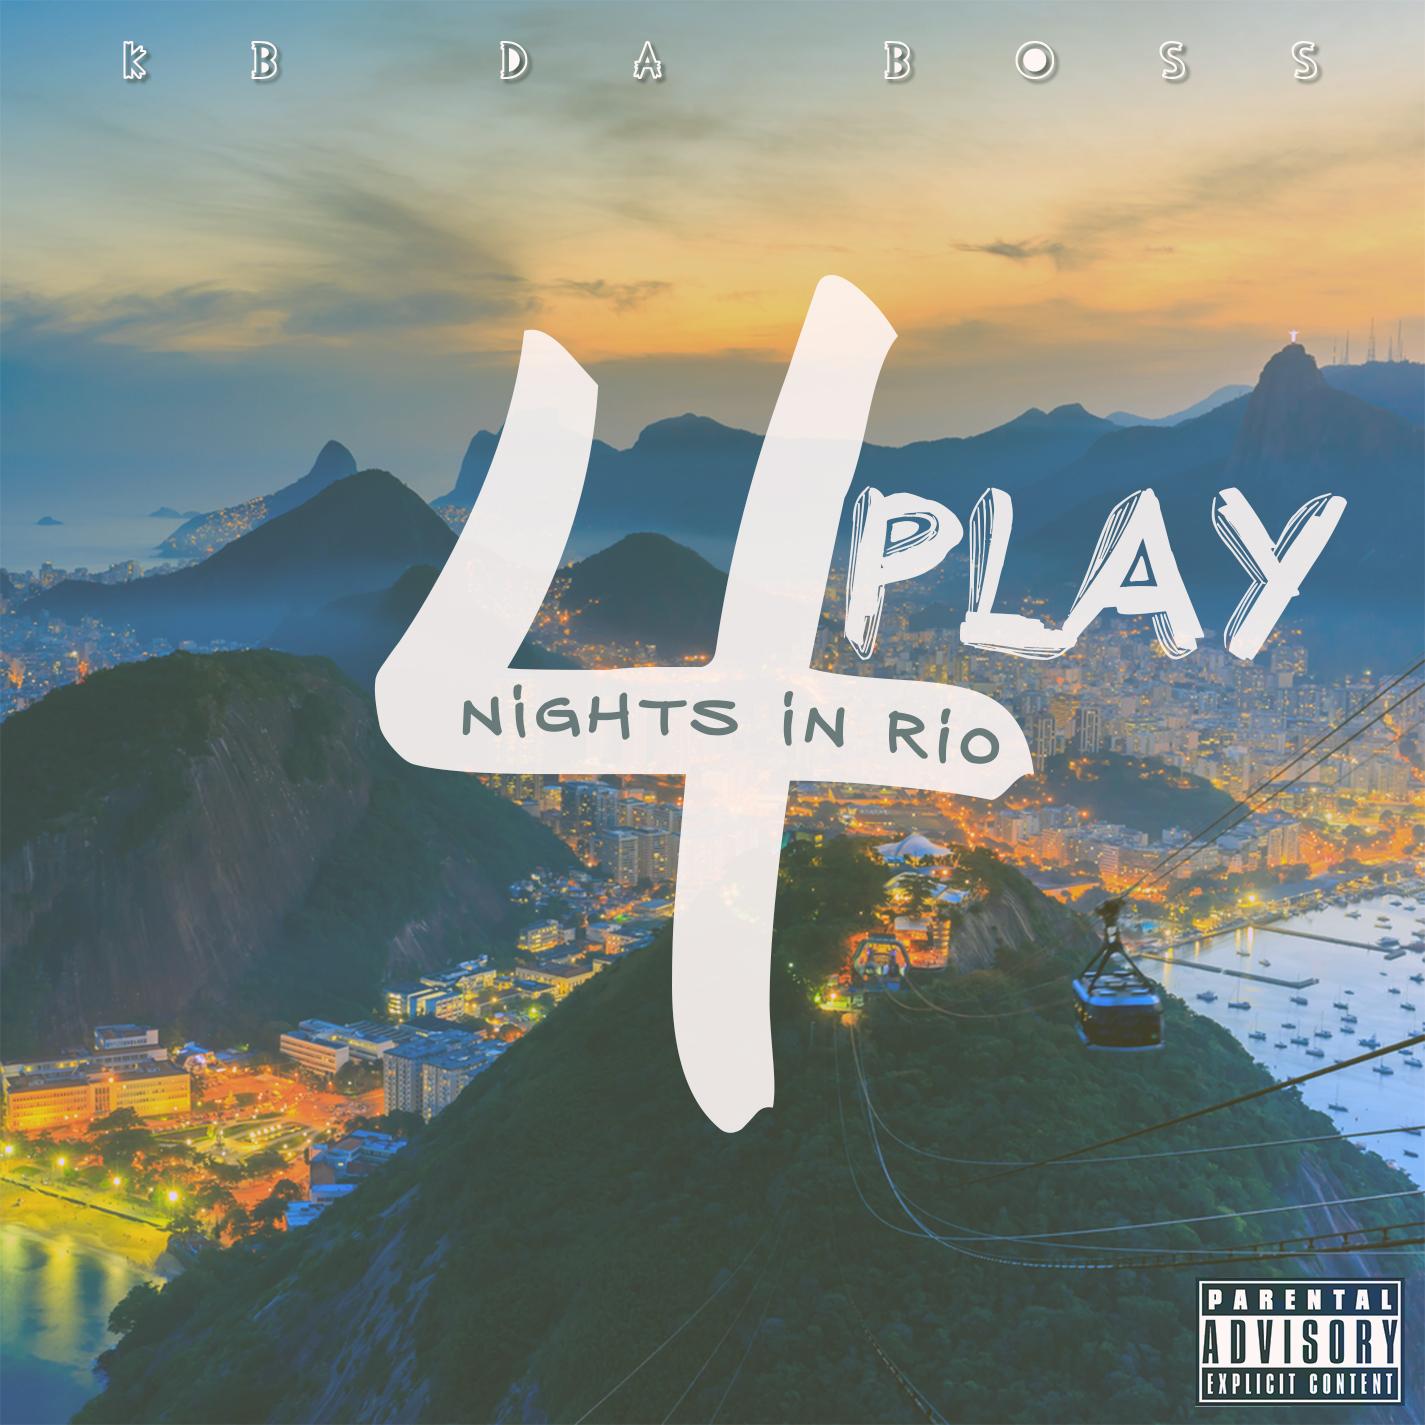 4 play nights in rio.jpg